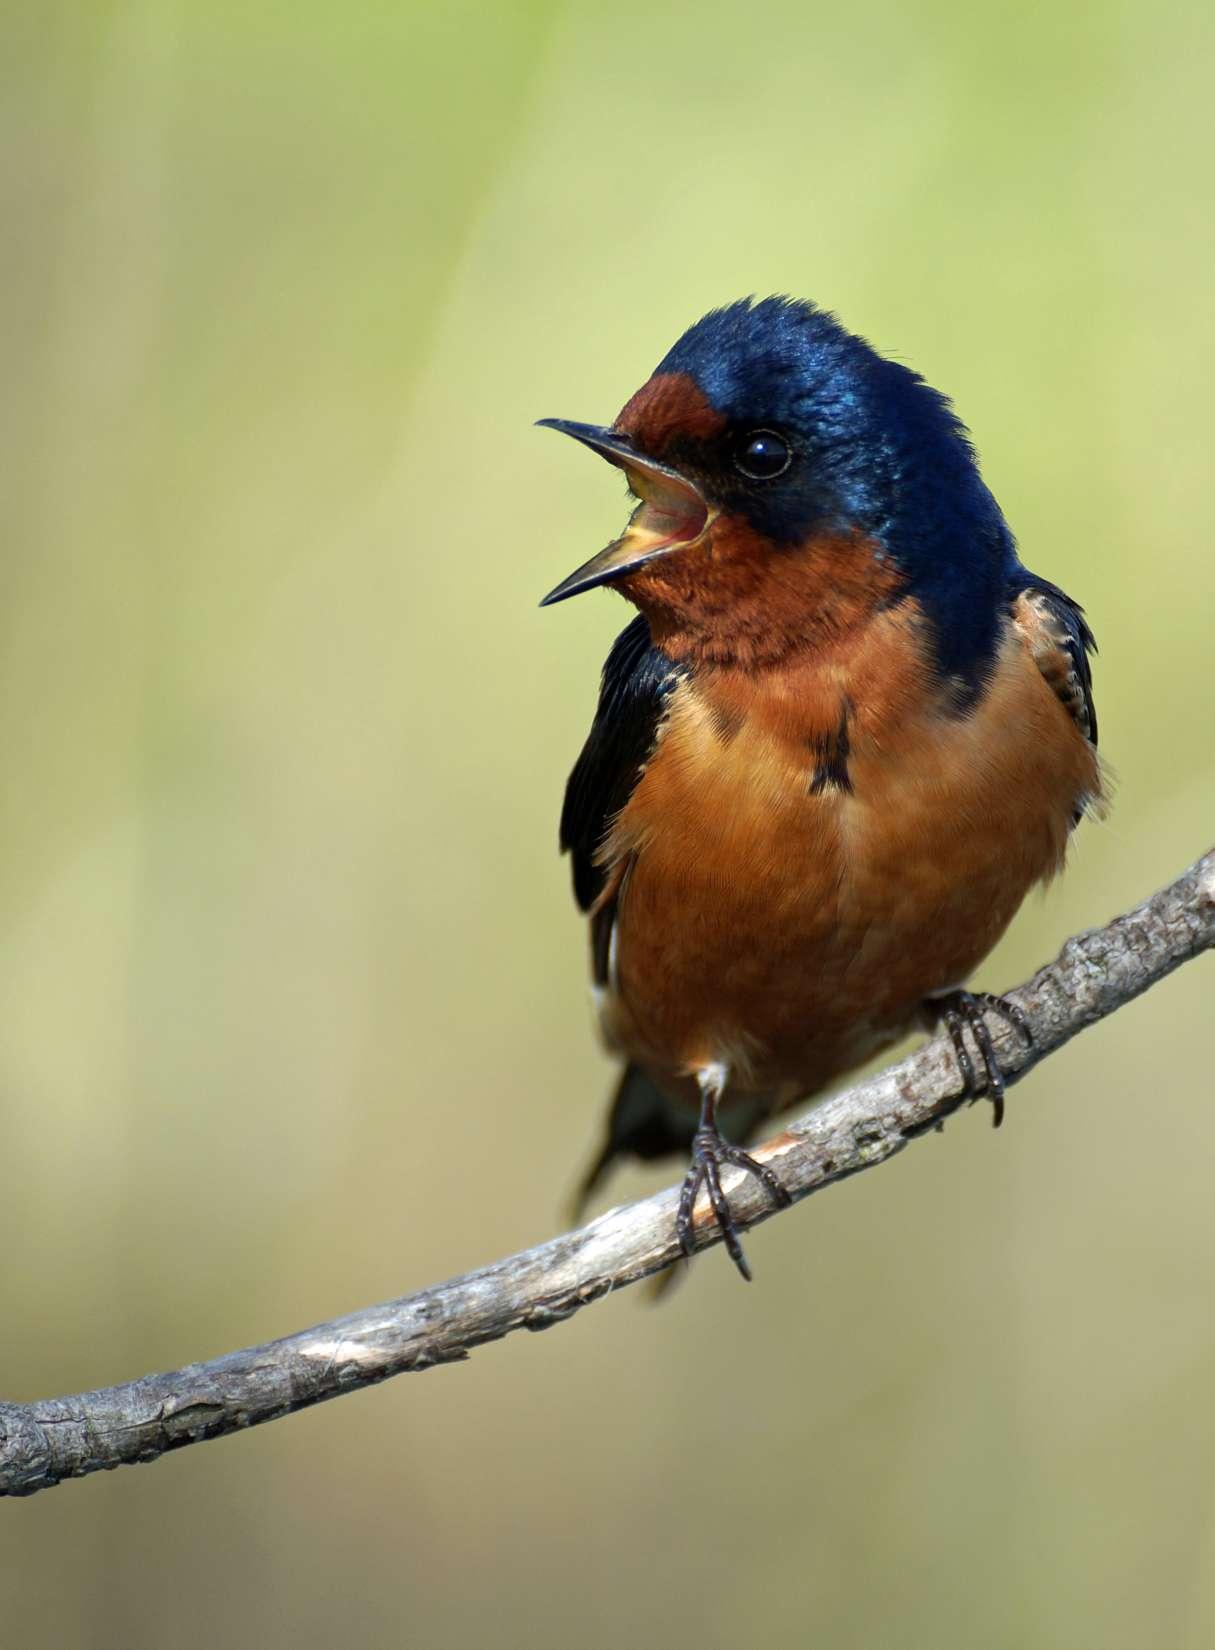 Fall bird migration begins in Ontario